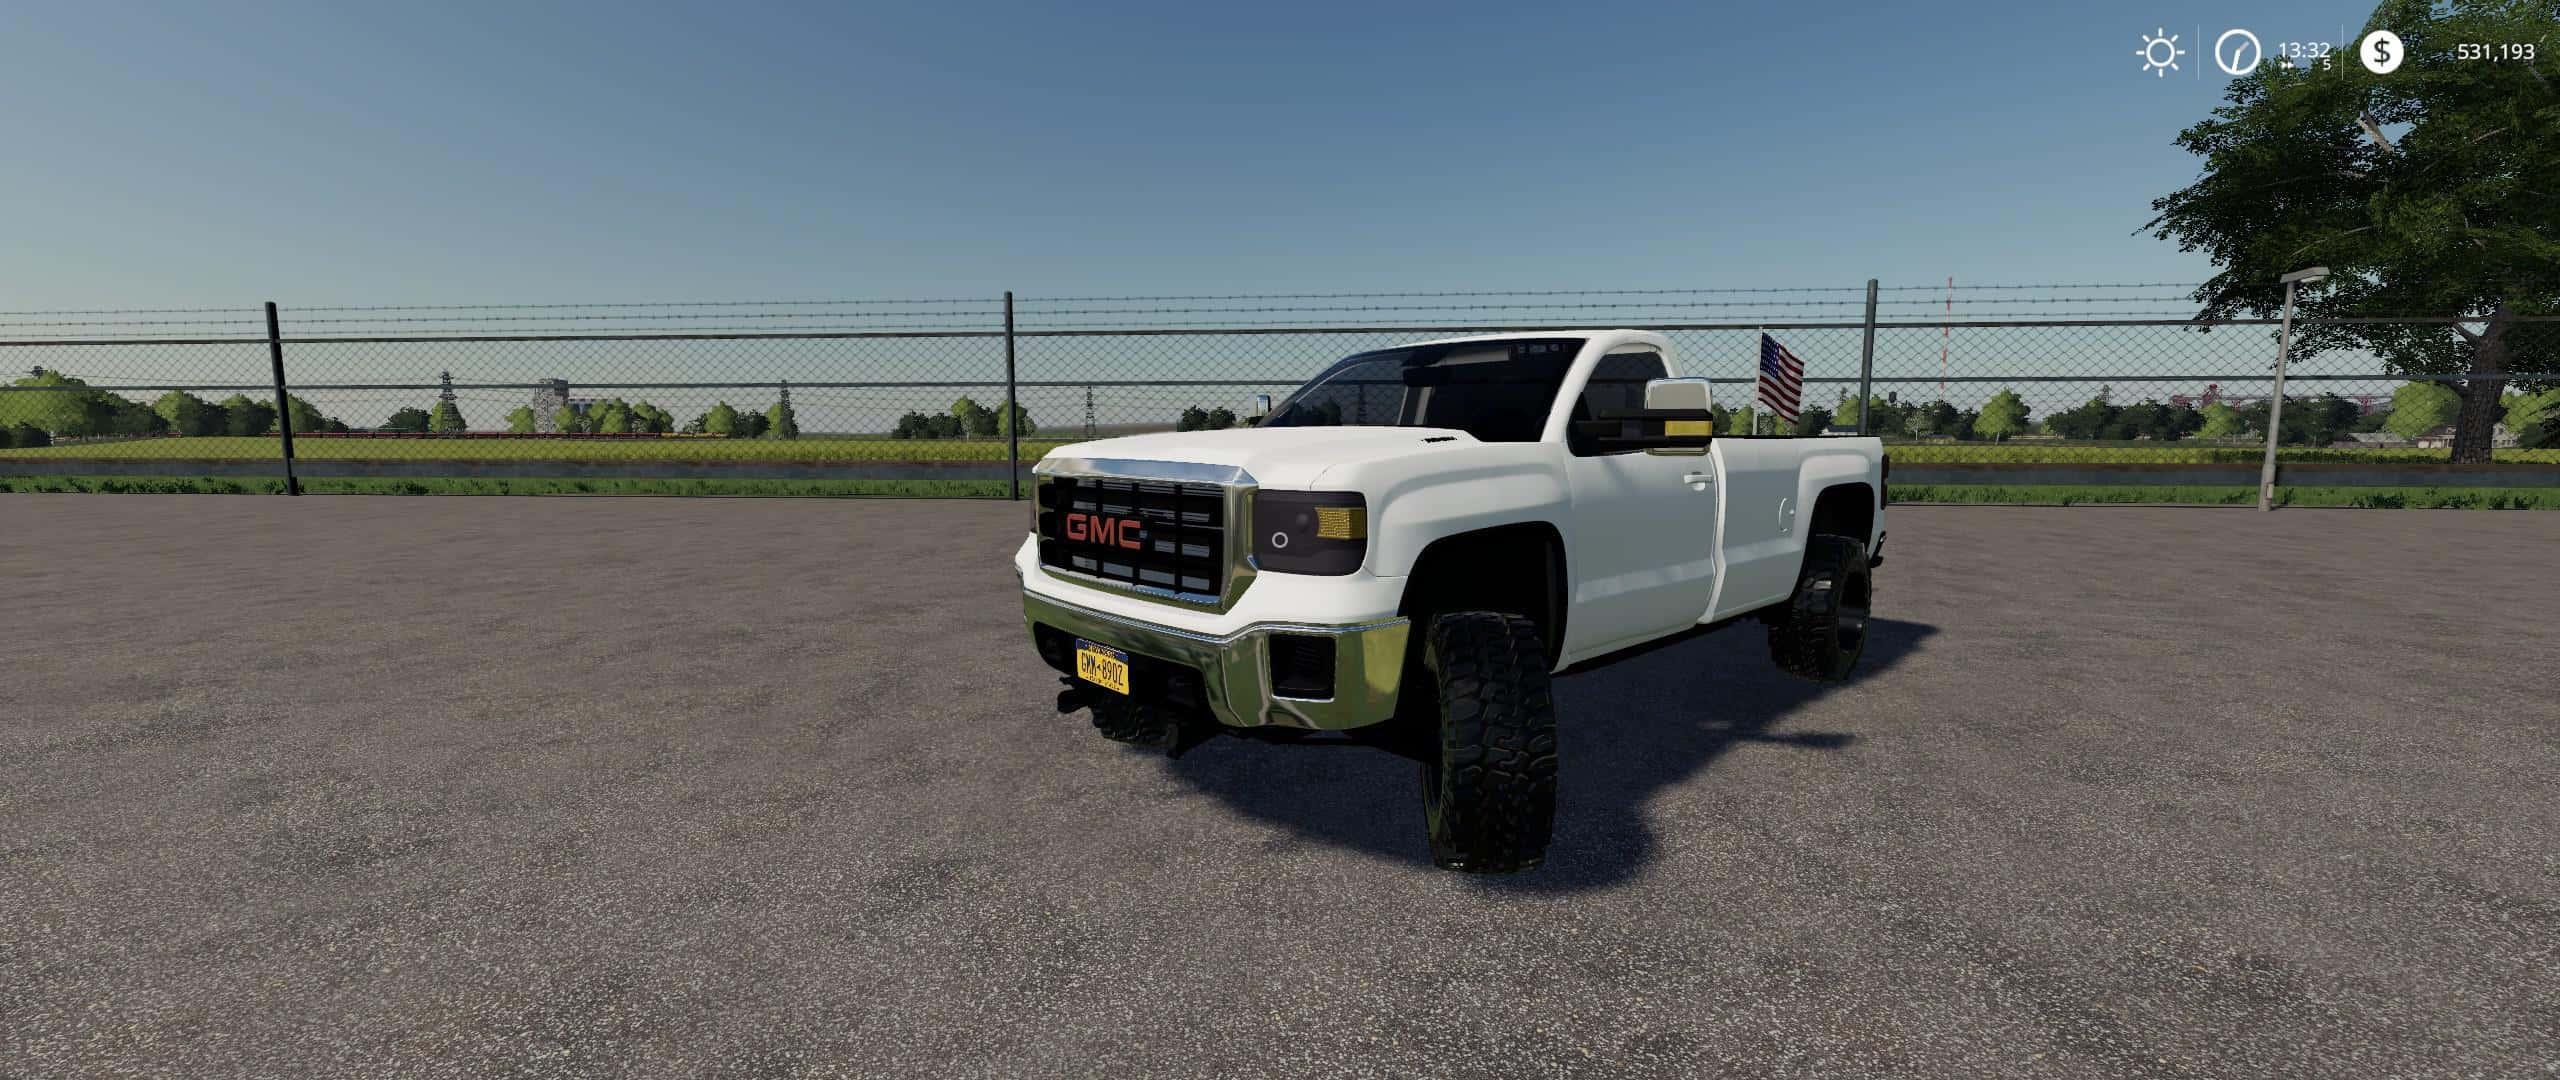 2015 GMC 3500 v2 0 0 0 Mod - Farming Simulator 19 Mod / FS19